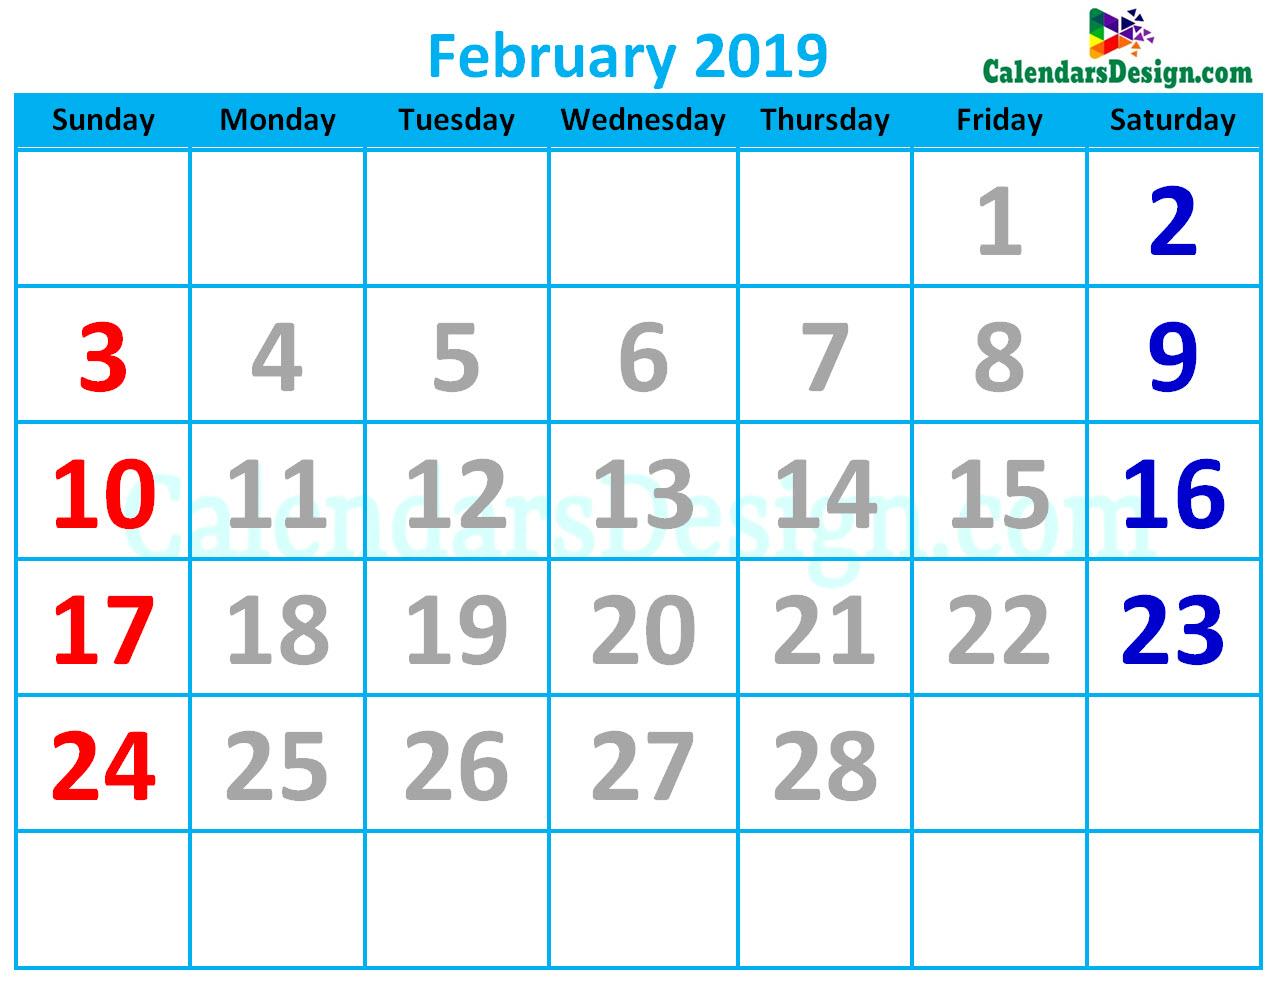 Cute Calendar for February 2019